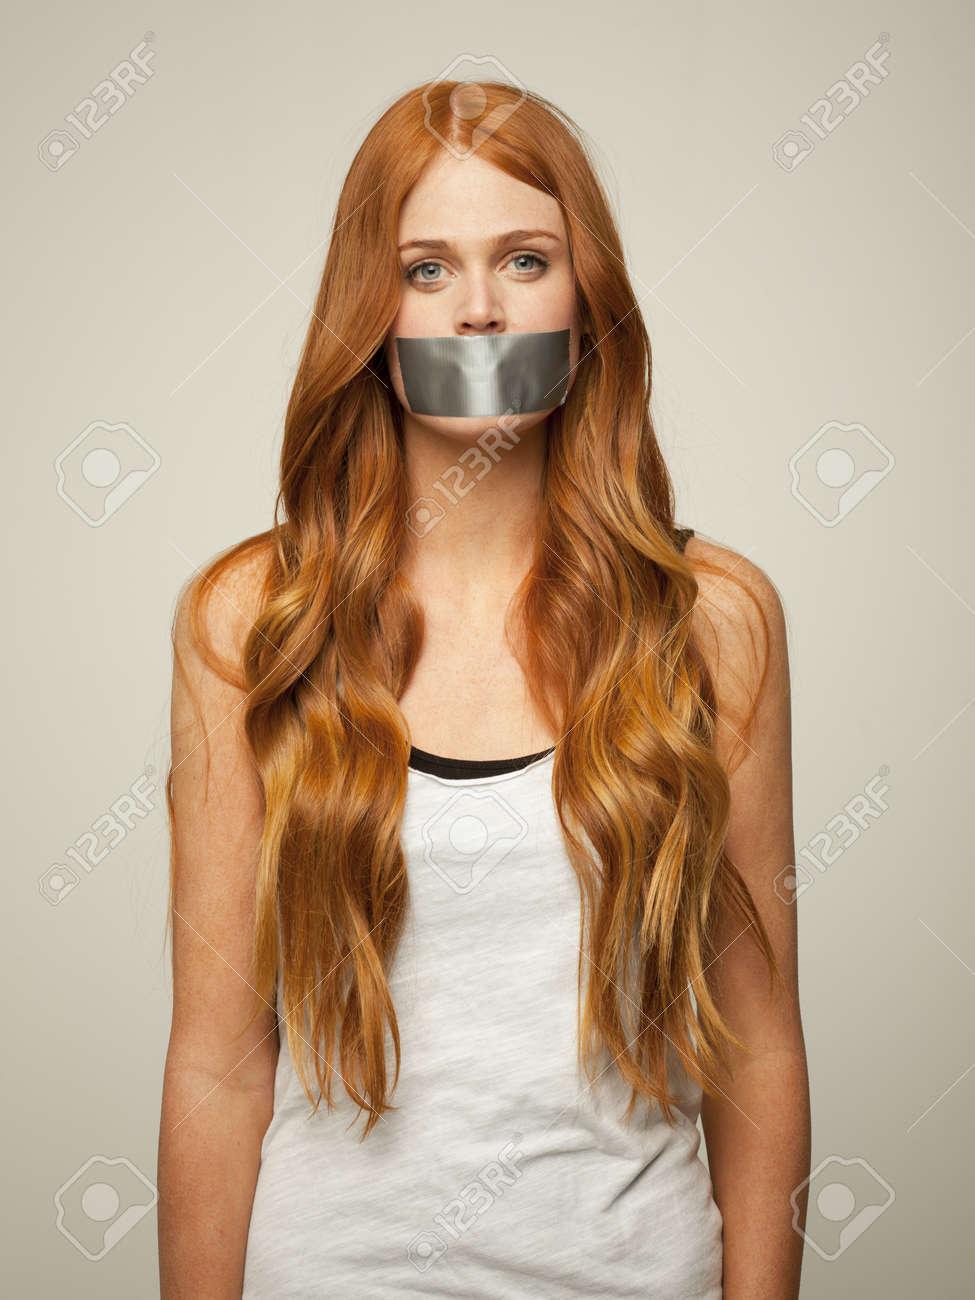 Femme Baillonnee studio photo de jeune femme bâillonnée avec du ruban adhésif